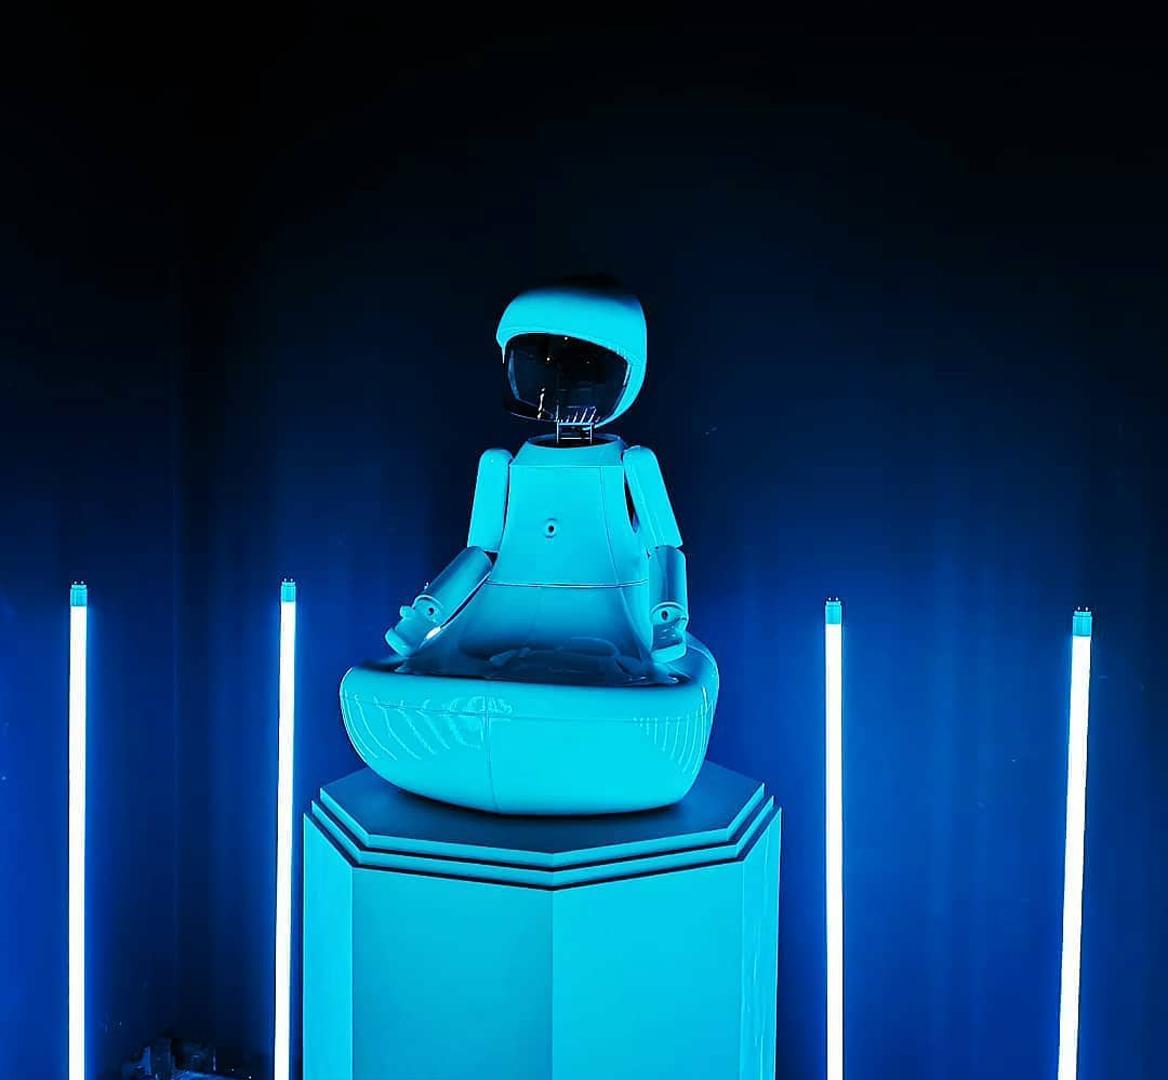 ©, LOVOT LAB, BUDDHA I + STAND I + The monument of robot ethics